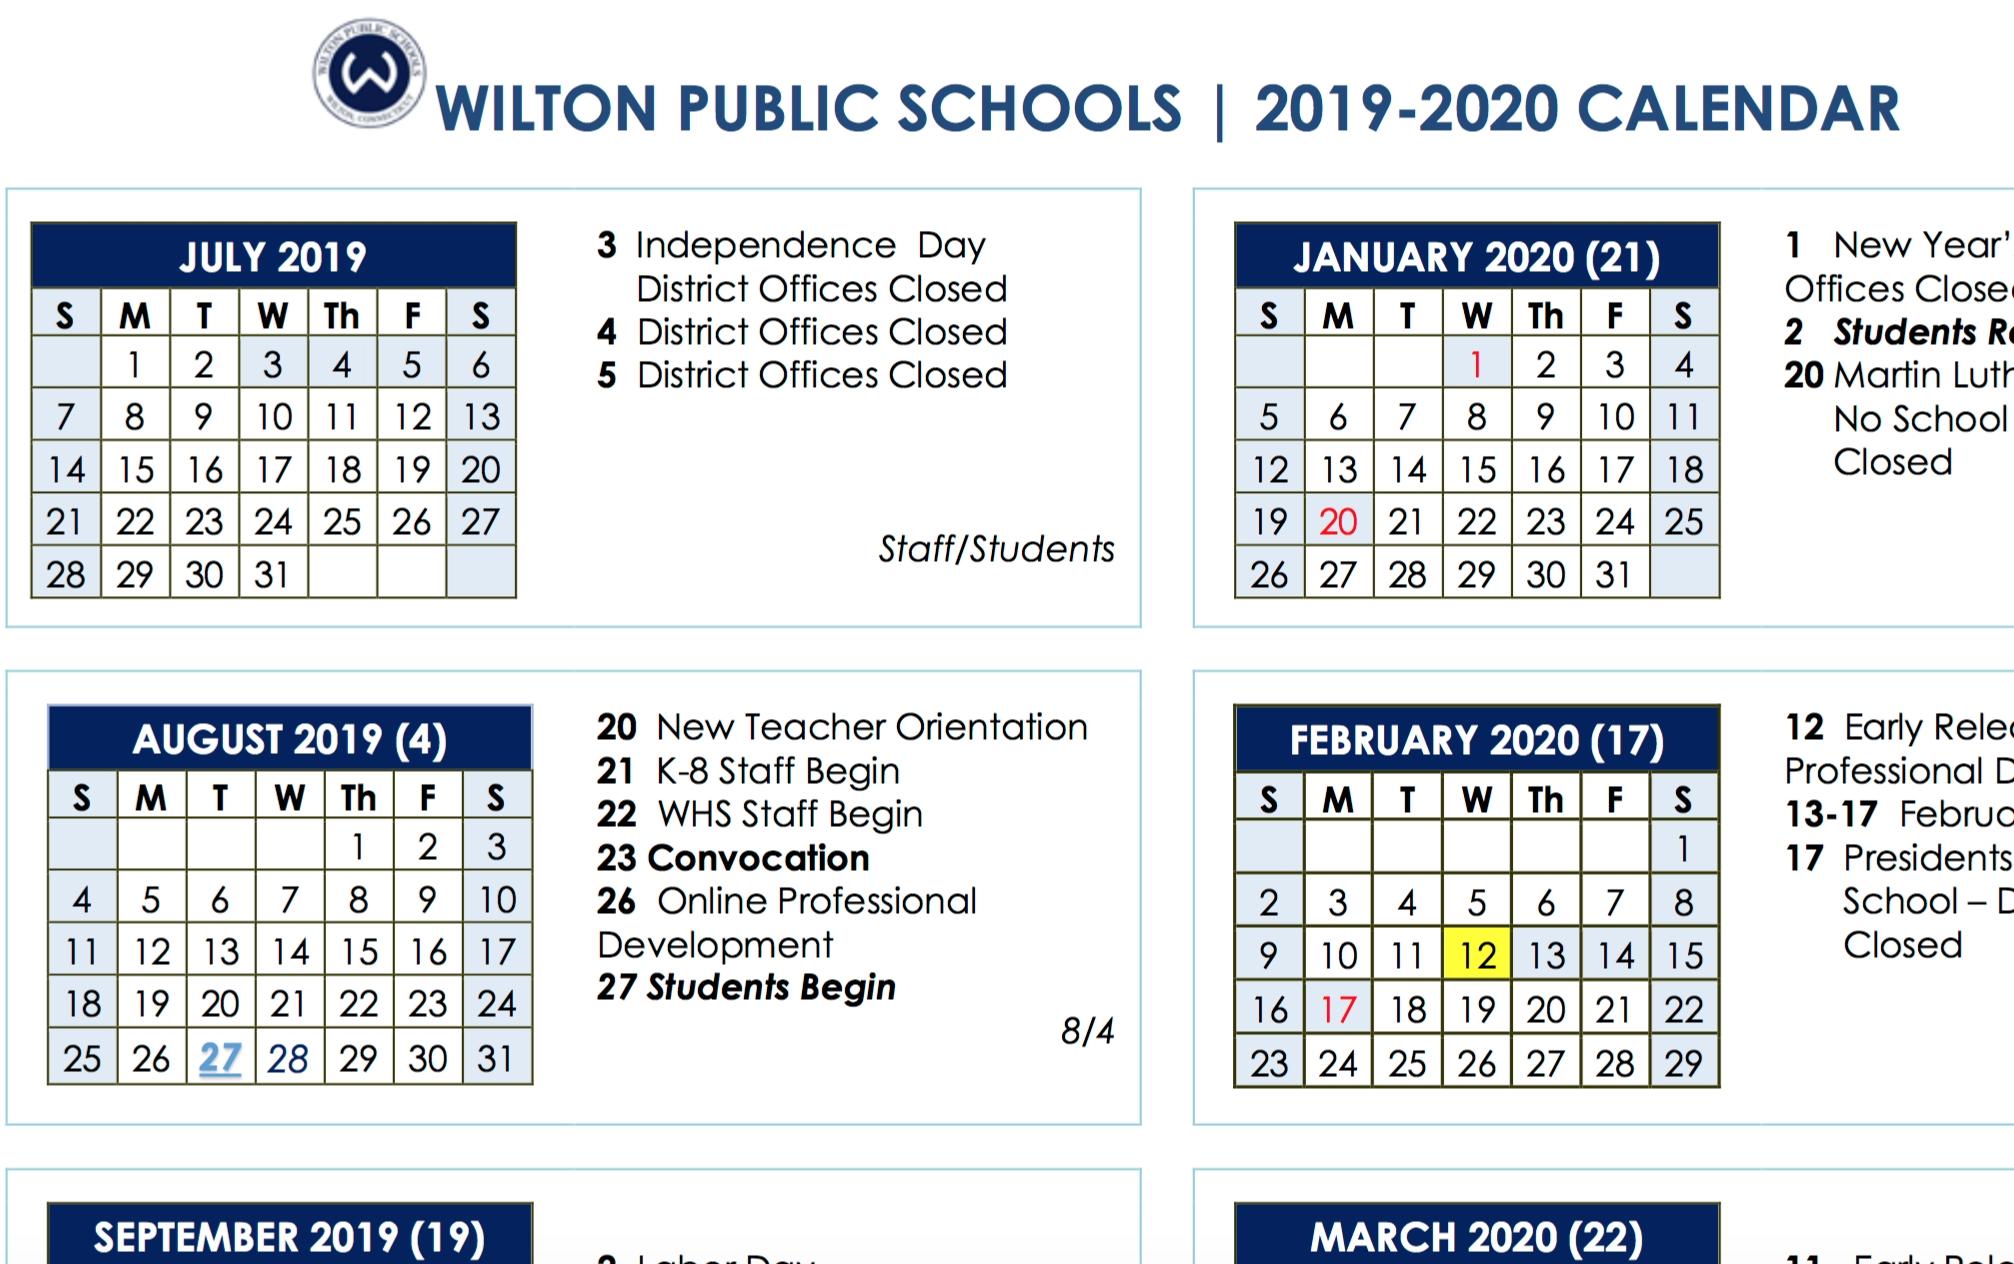 Special Days In The School Year 2019-2020 - Calendar ...